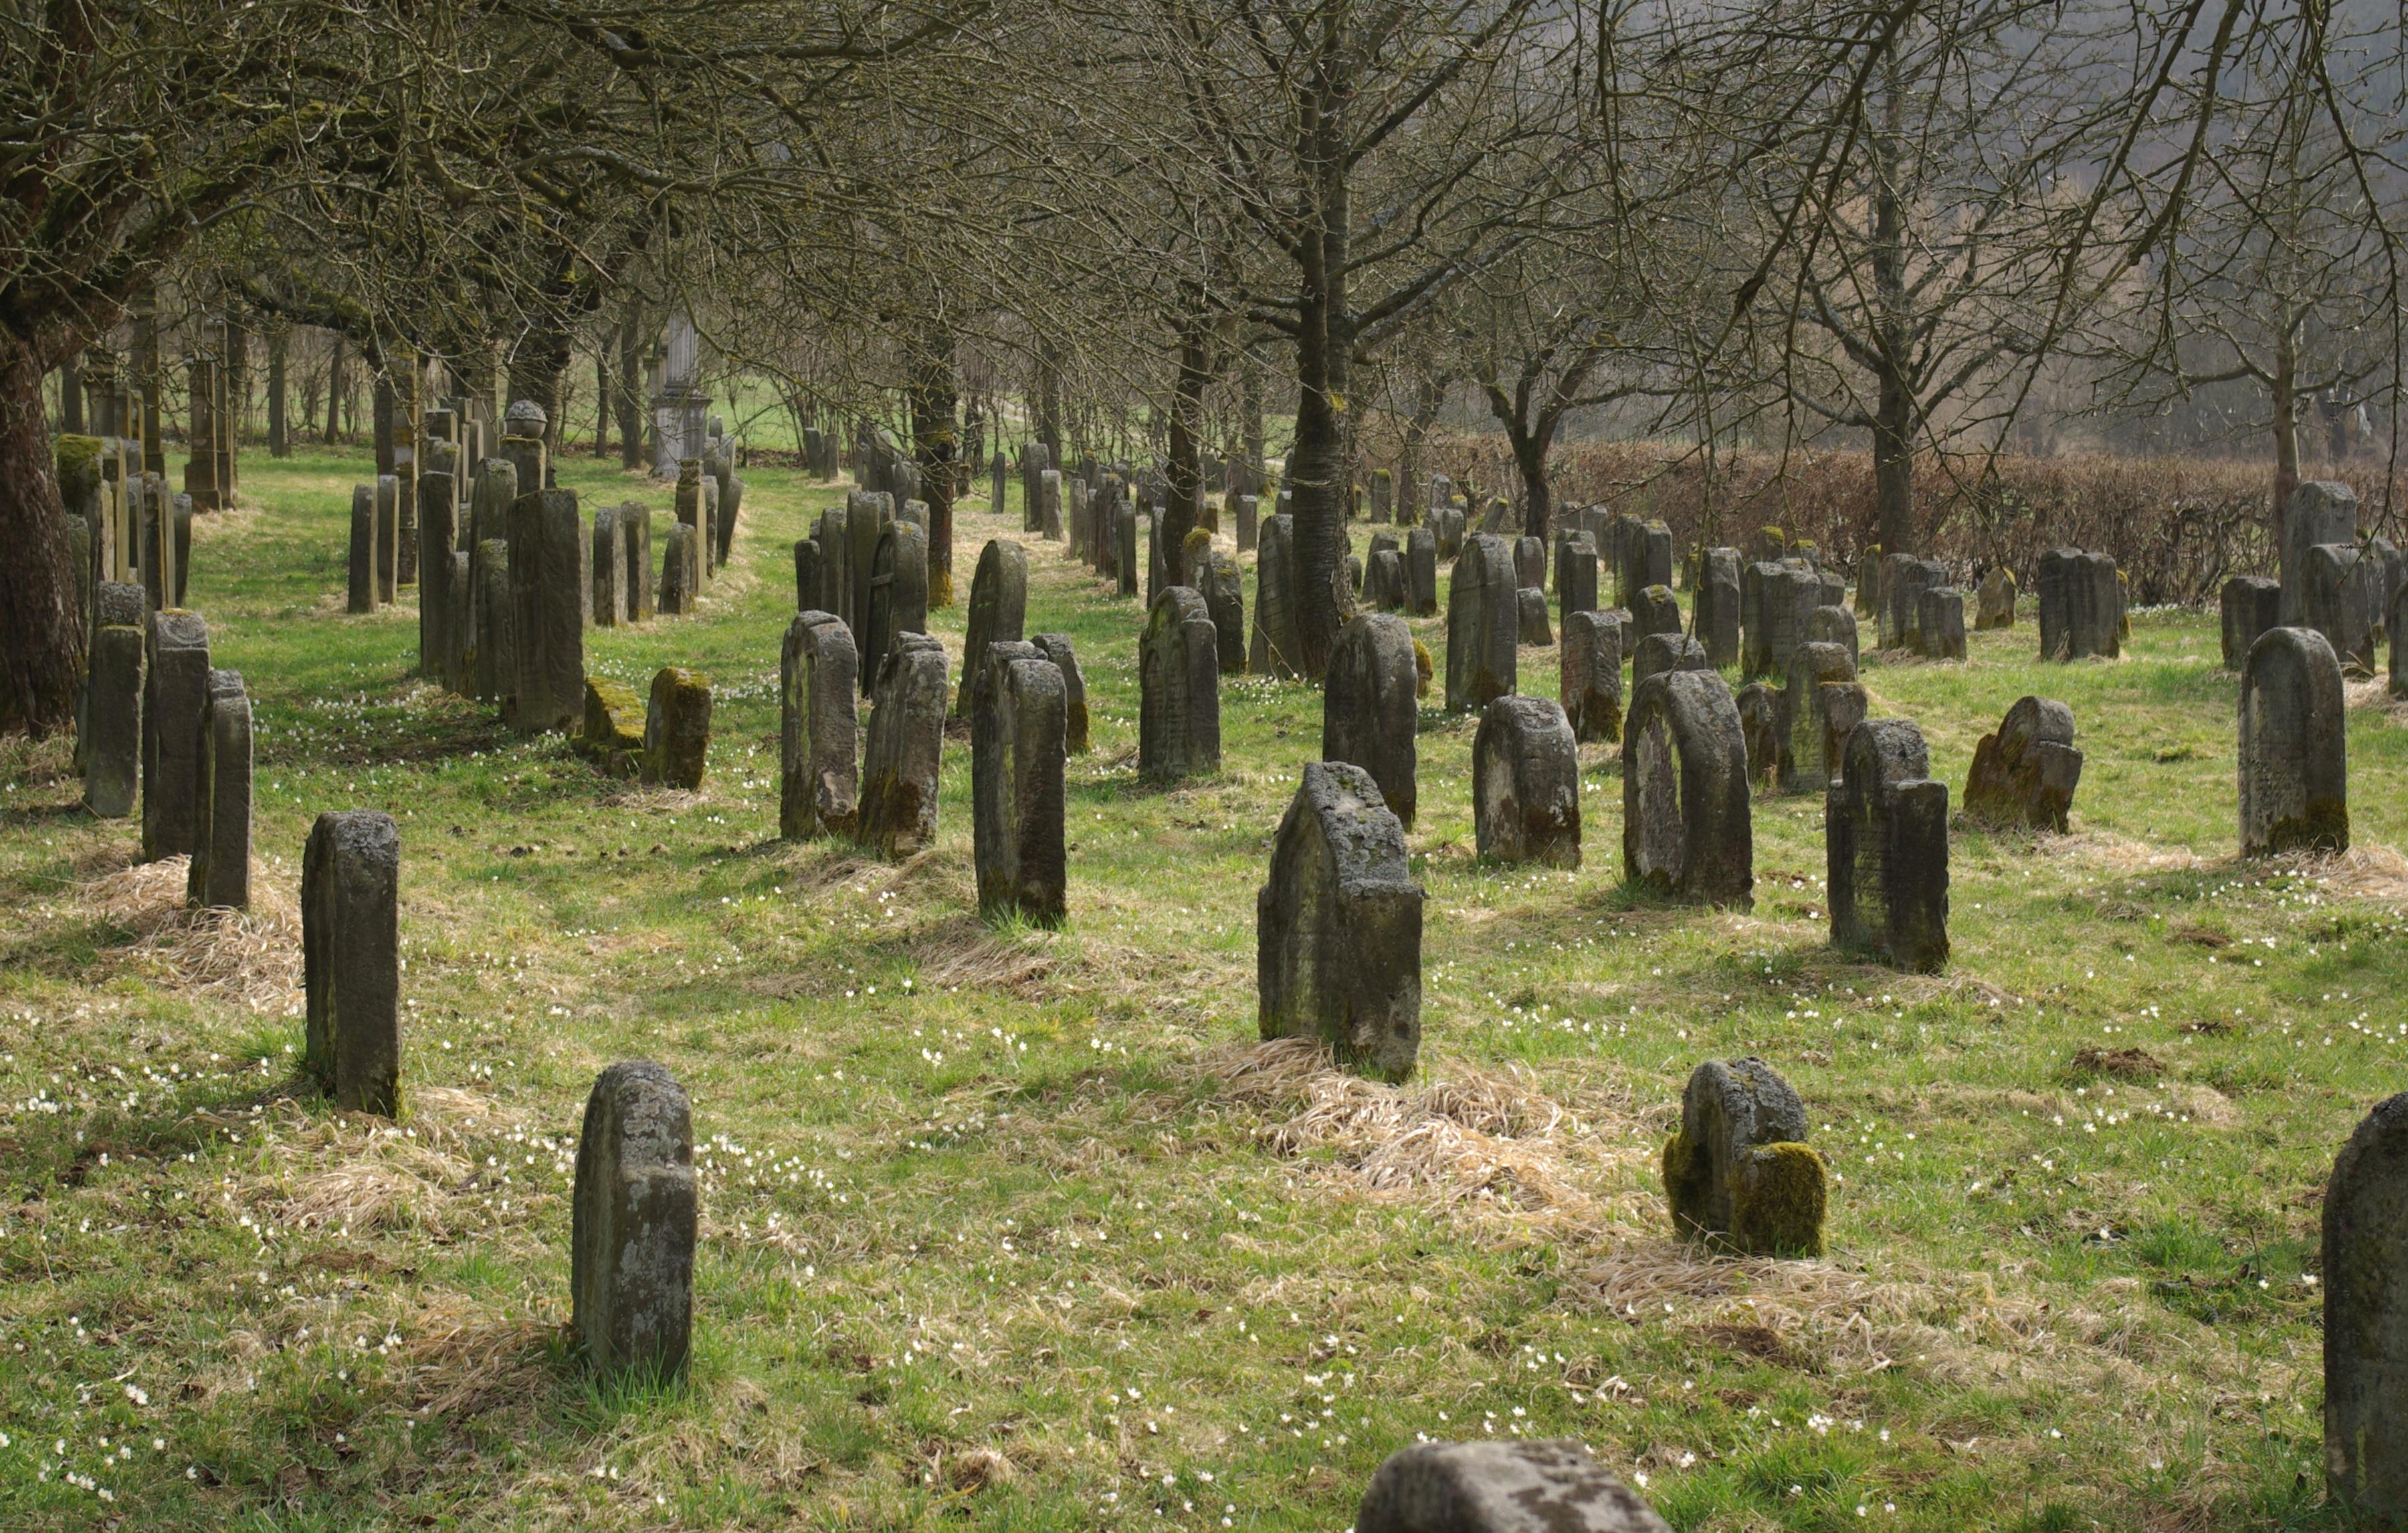 https://upload.wikimedia.org/wikipedia/commons/9/9f/Pretzfeld_J%C3%BCdischer_Friedhof_Hagenbach_011.JPG